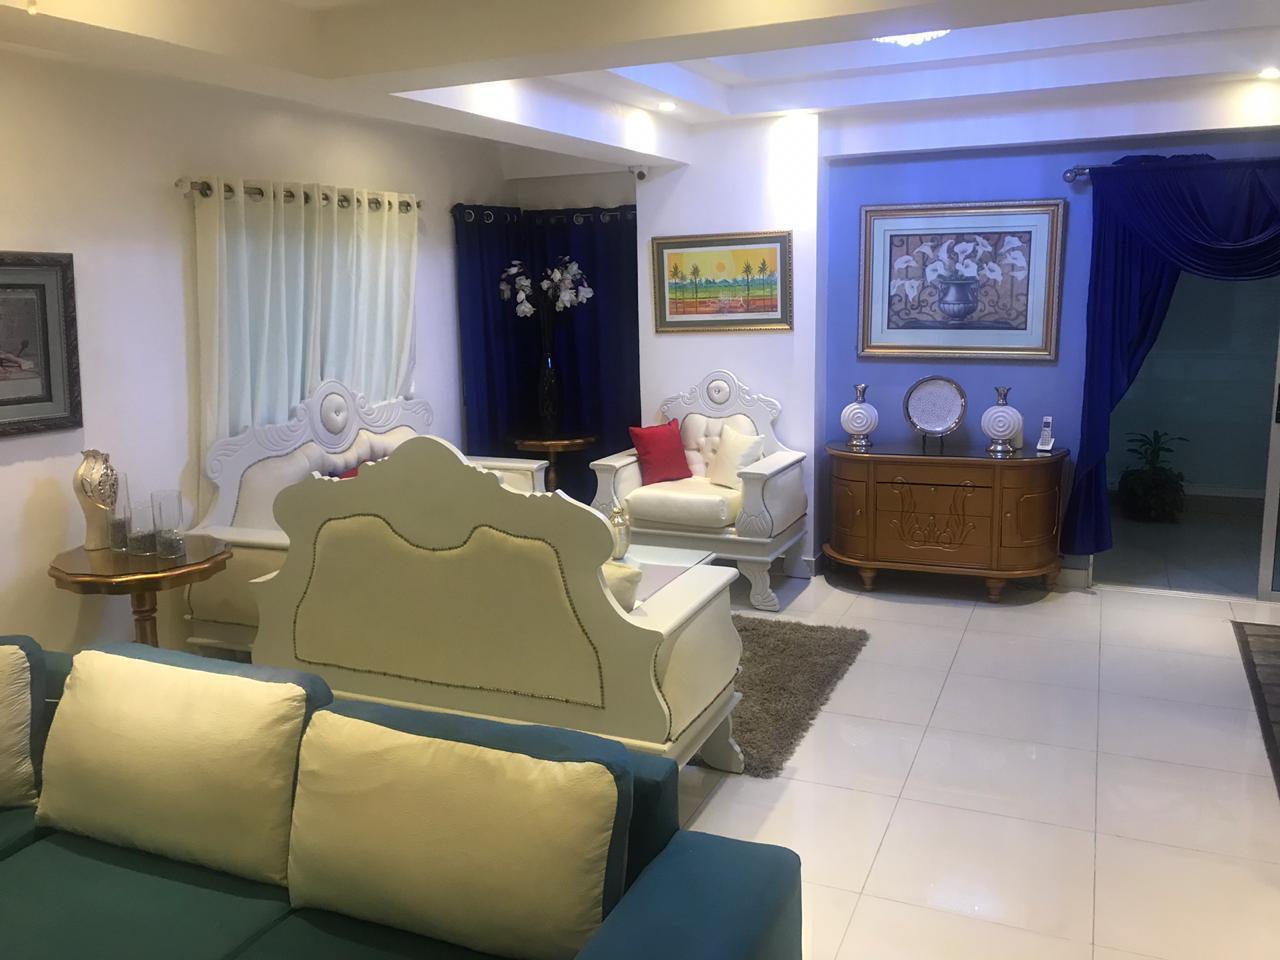 Apartamento Santo Domingo>Distrito Nacional>Naco - Venta:290.000 Dolares - codigo: 22-654